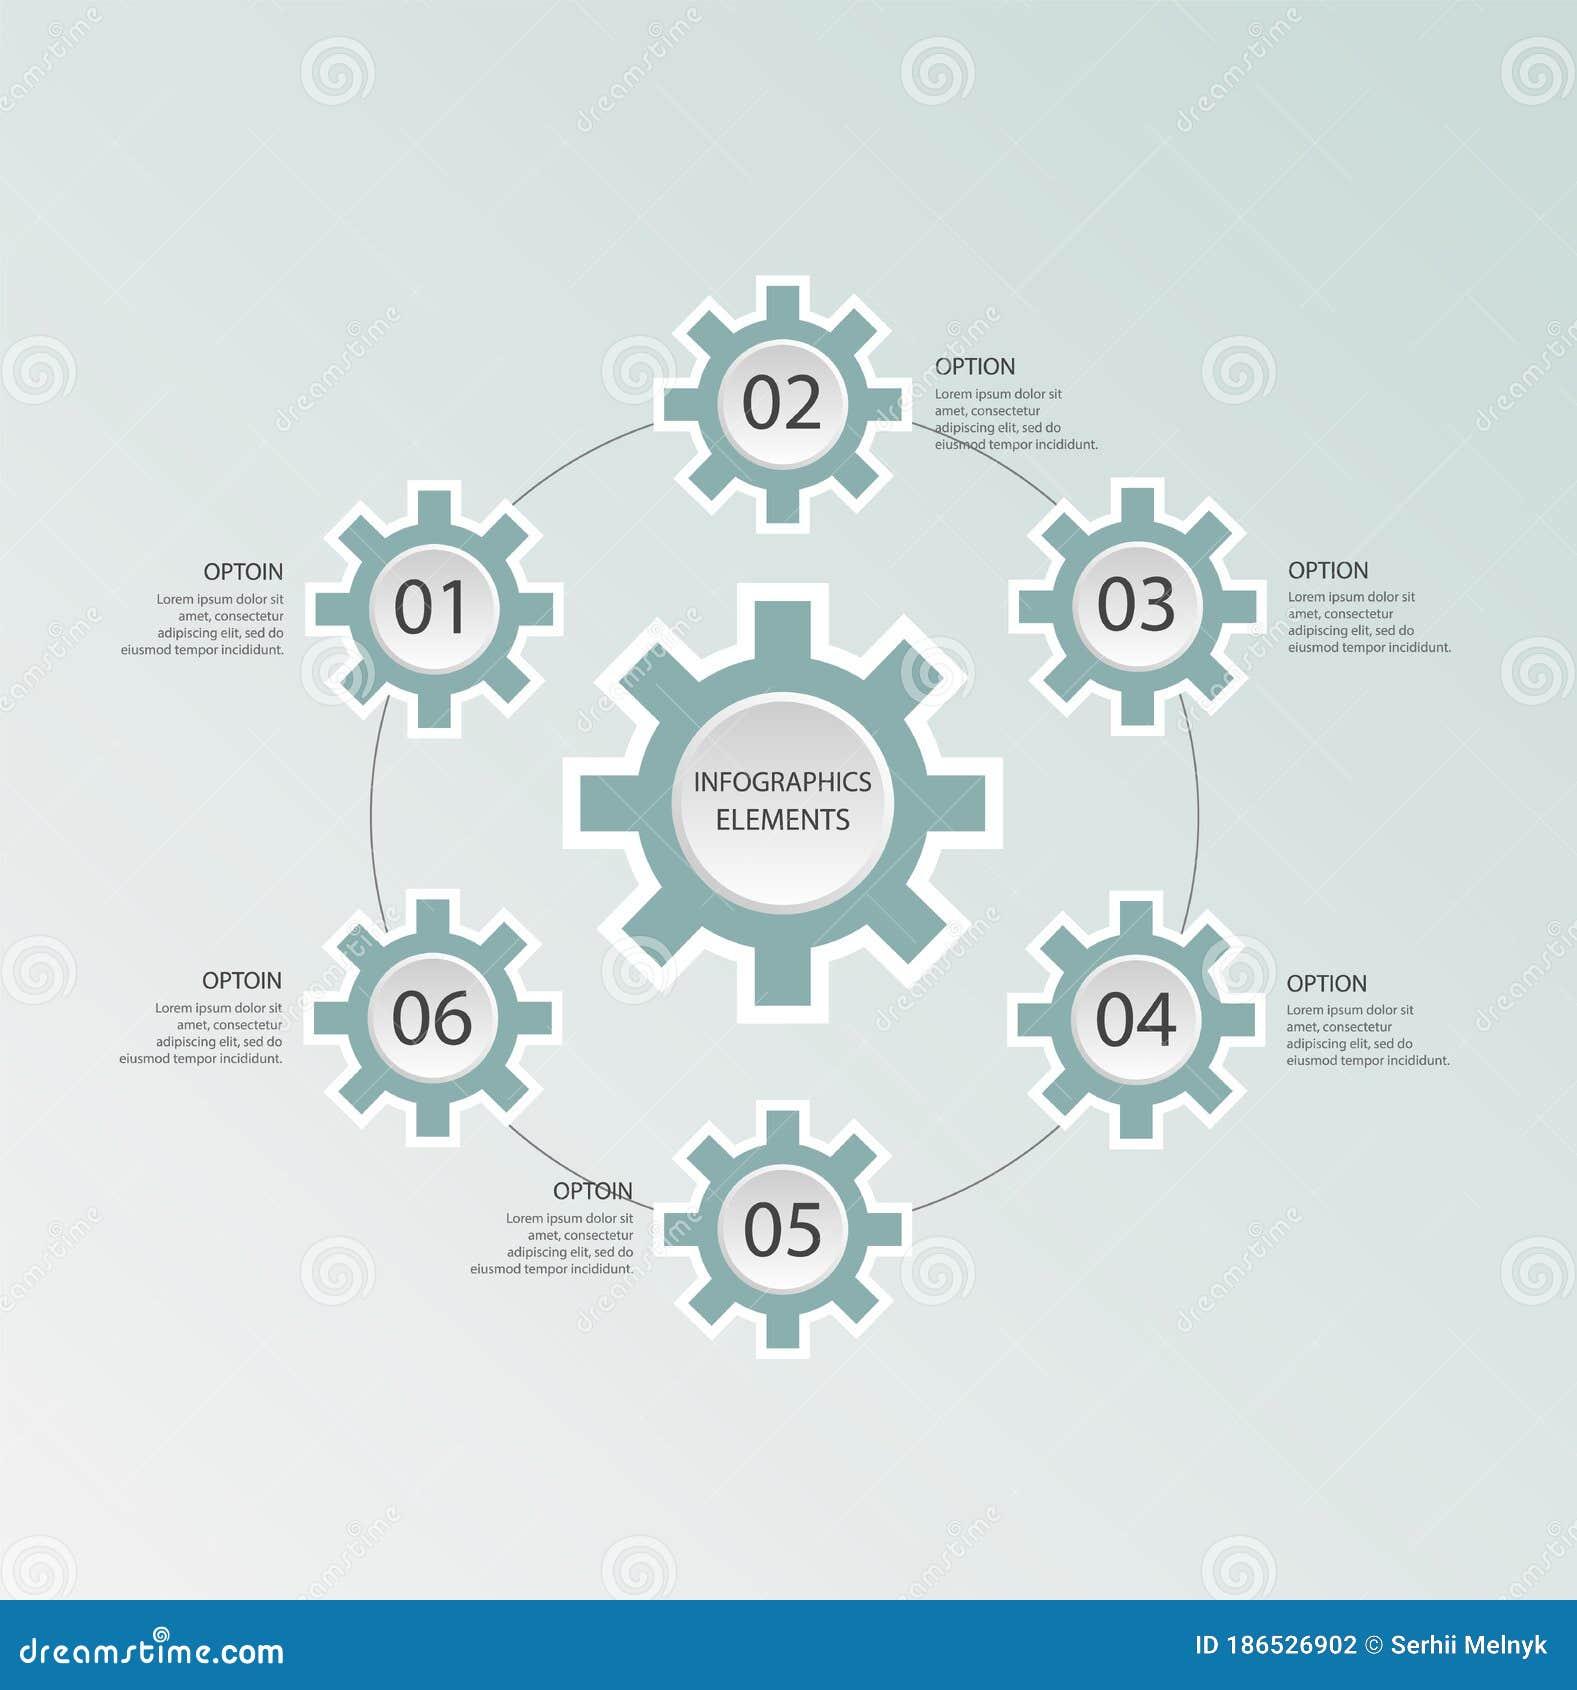 Flowchart Diagram Vector Stock Vector Illustration Of Business 186526902